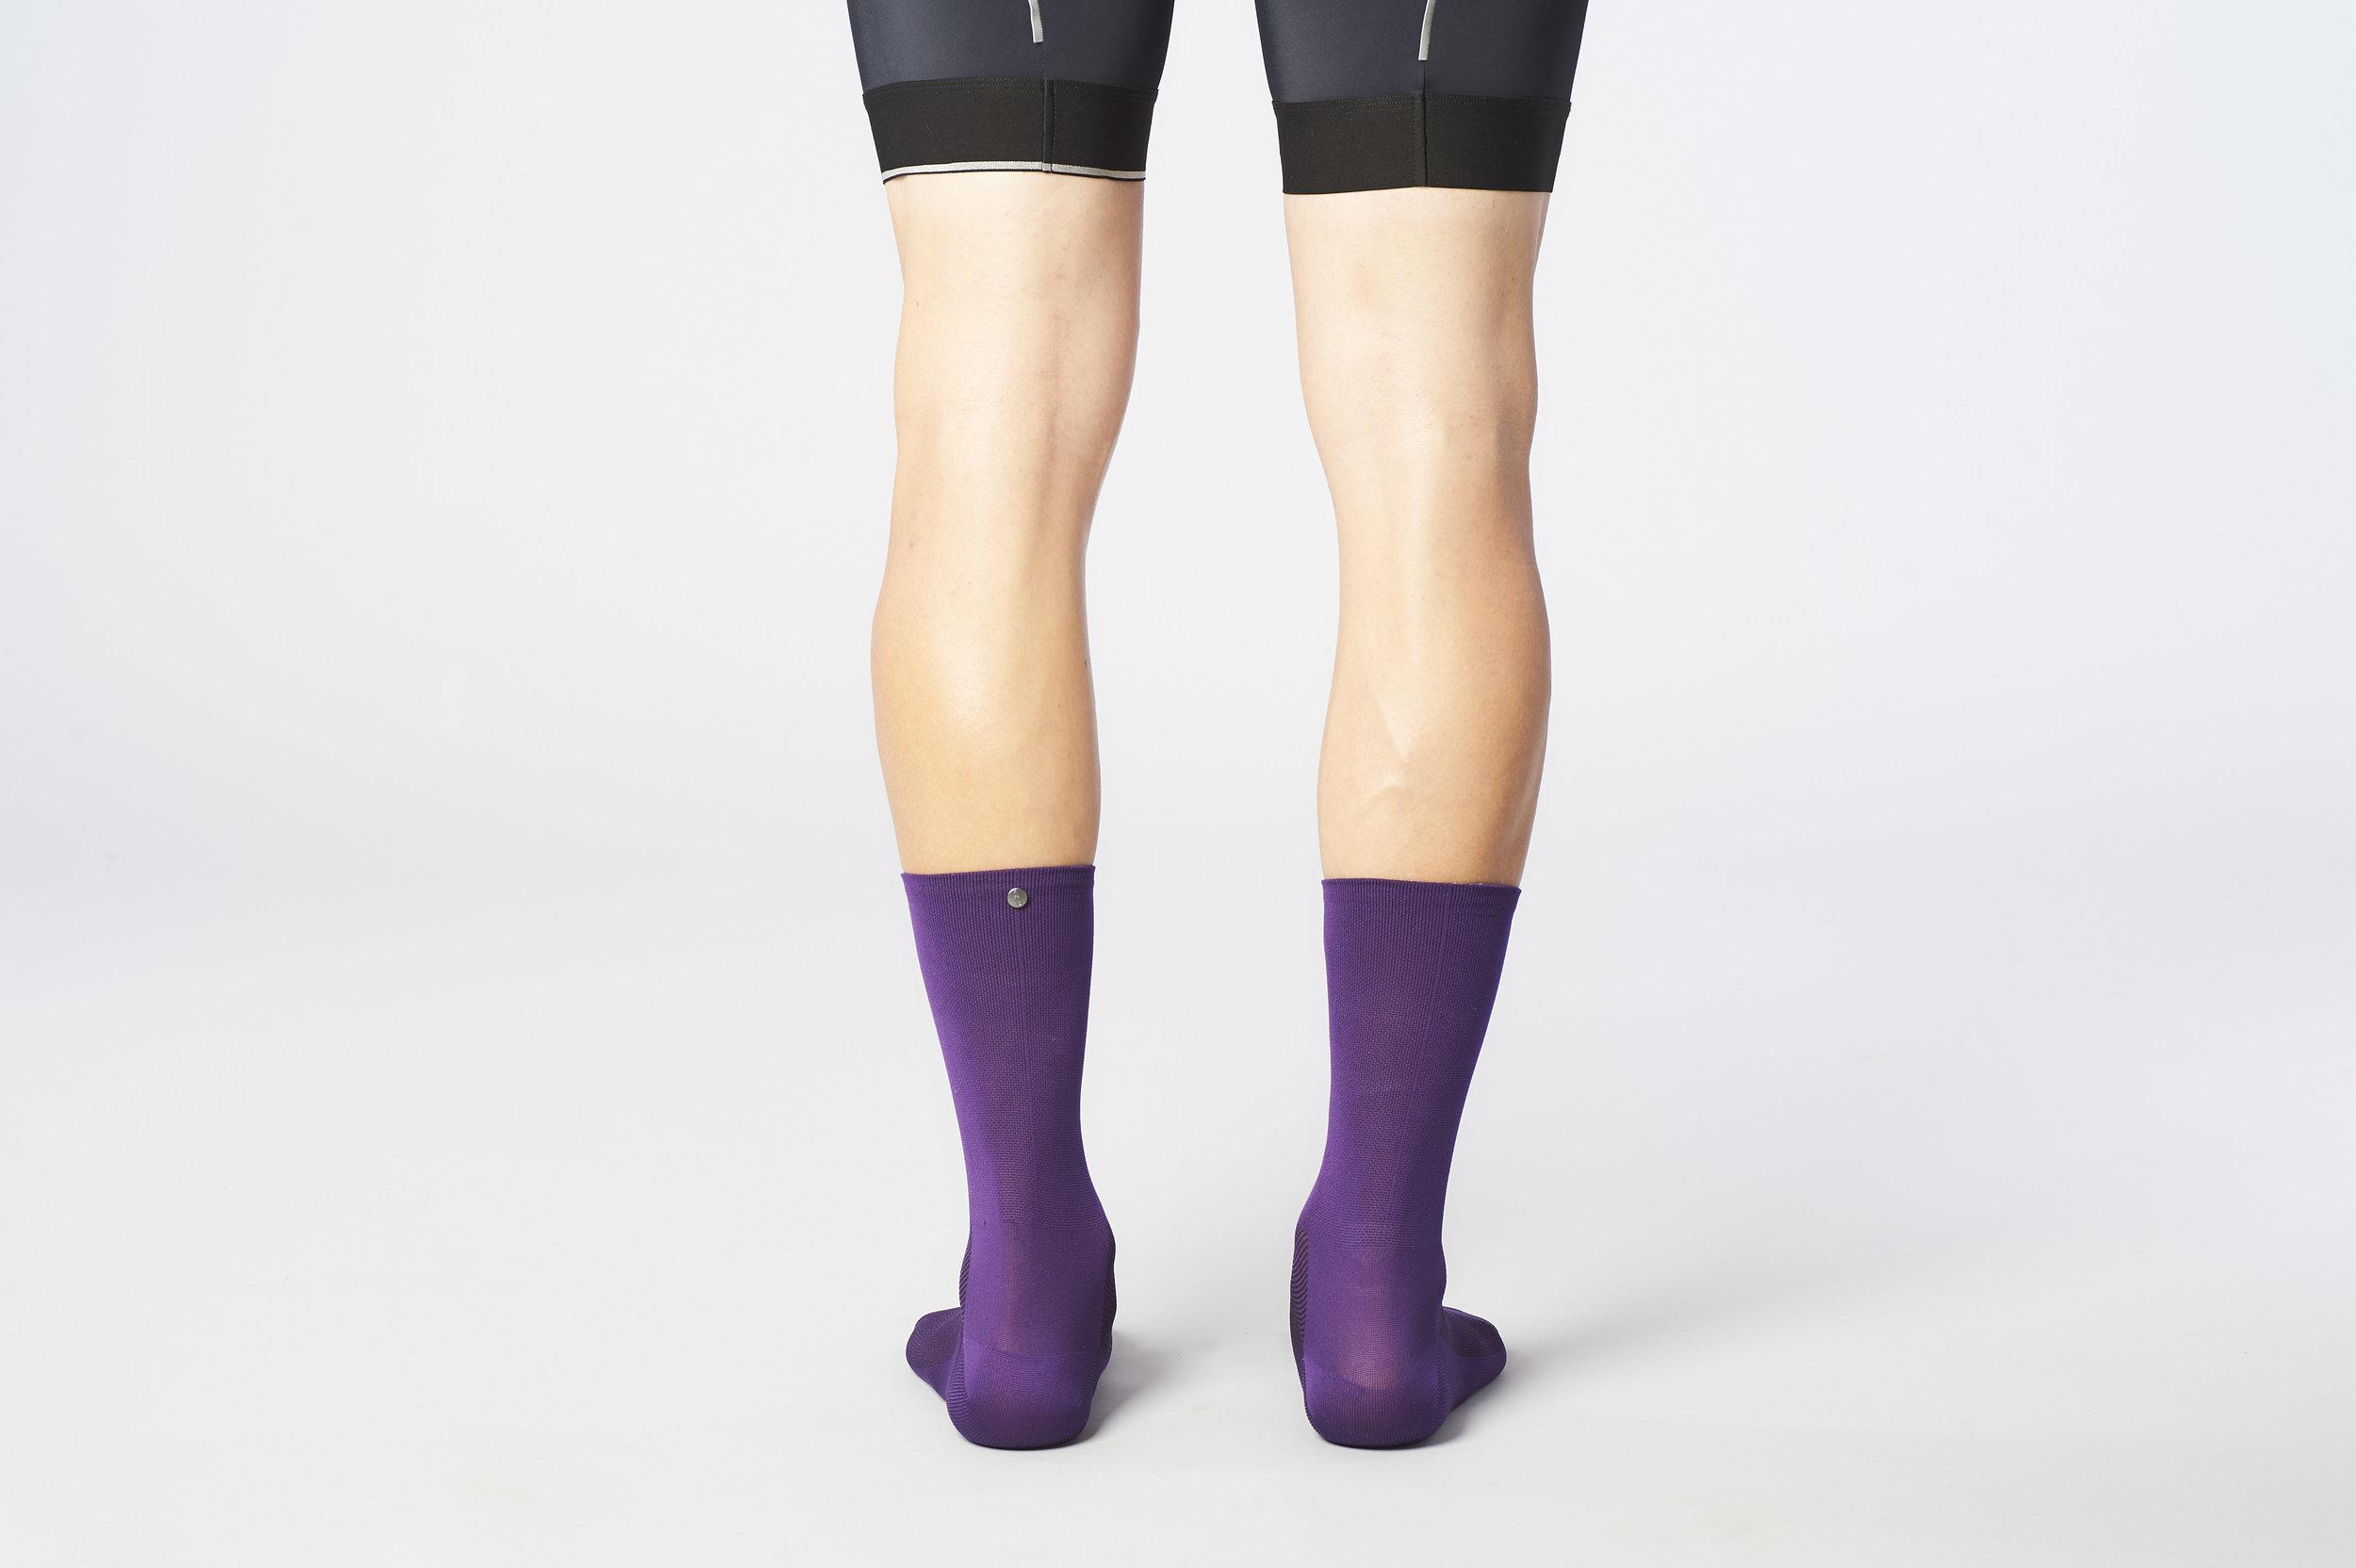 c purple haze4.jpg